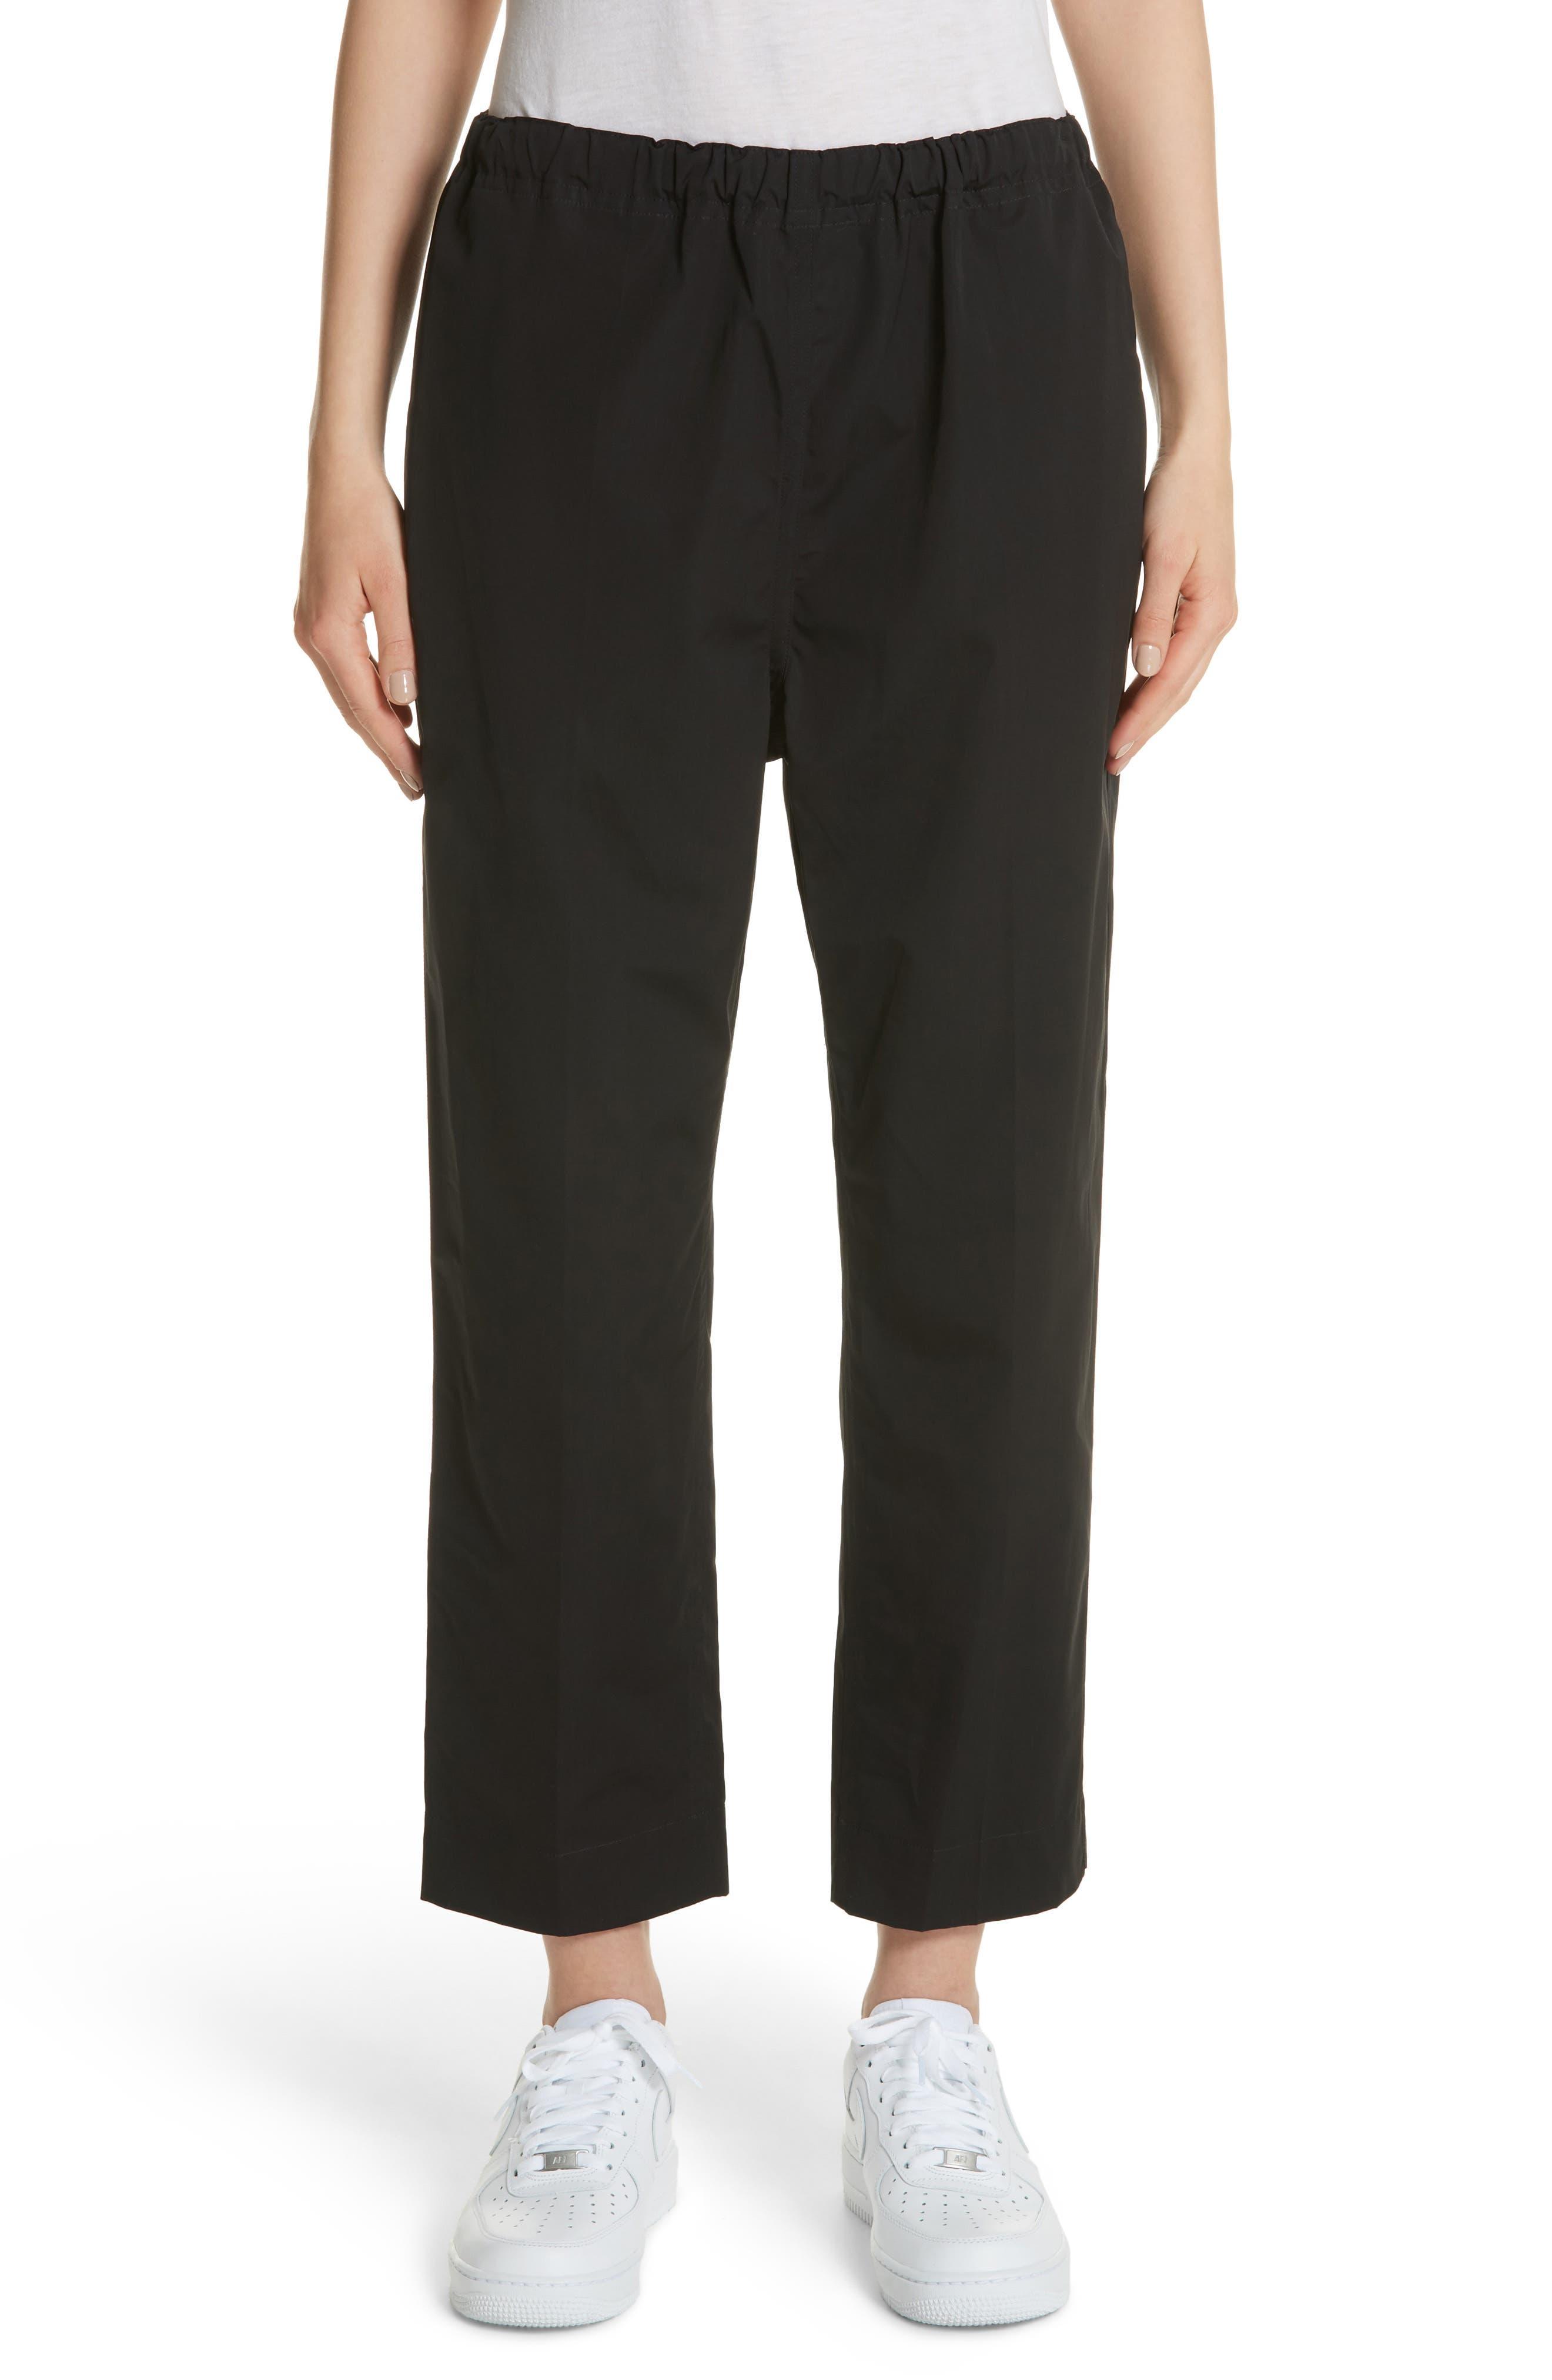 Carrot Pants,                         Main,                         color, Black